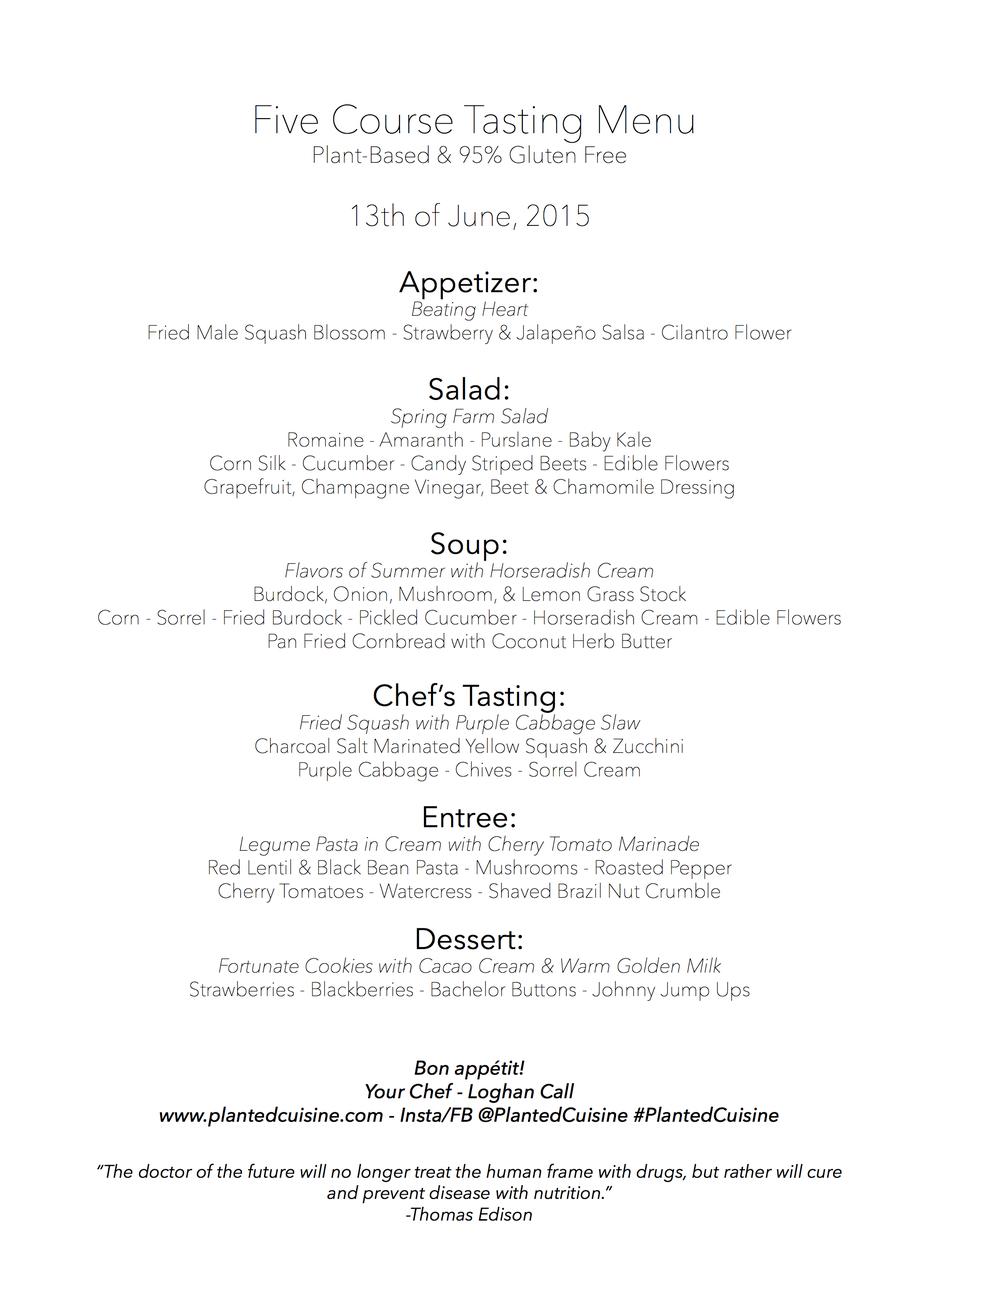 Chef's Tasting Menu - 6.13.15.jpg